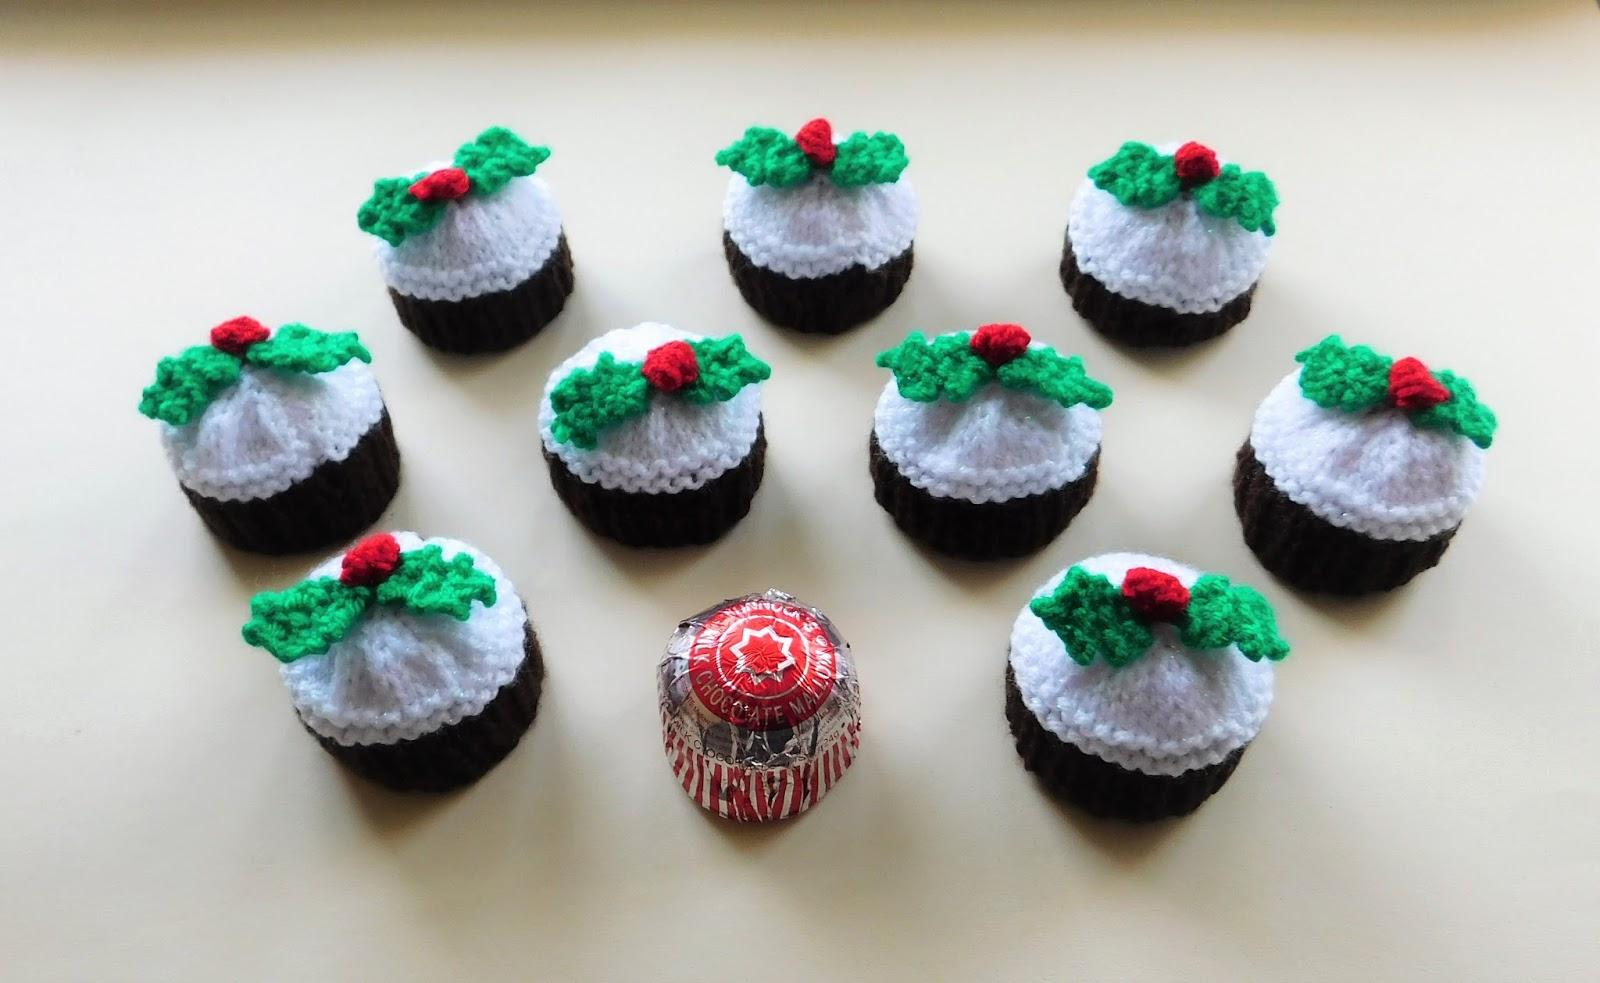 Christmas Knitting Patterns For Ferrero Rocher.Marianna S Lazy Daisy Days Tunnock S Teacakes Christmas